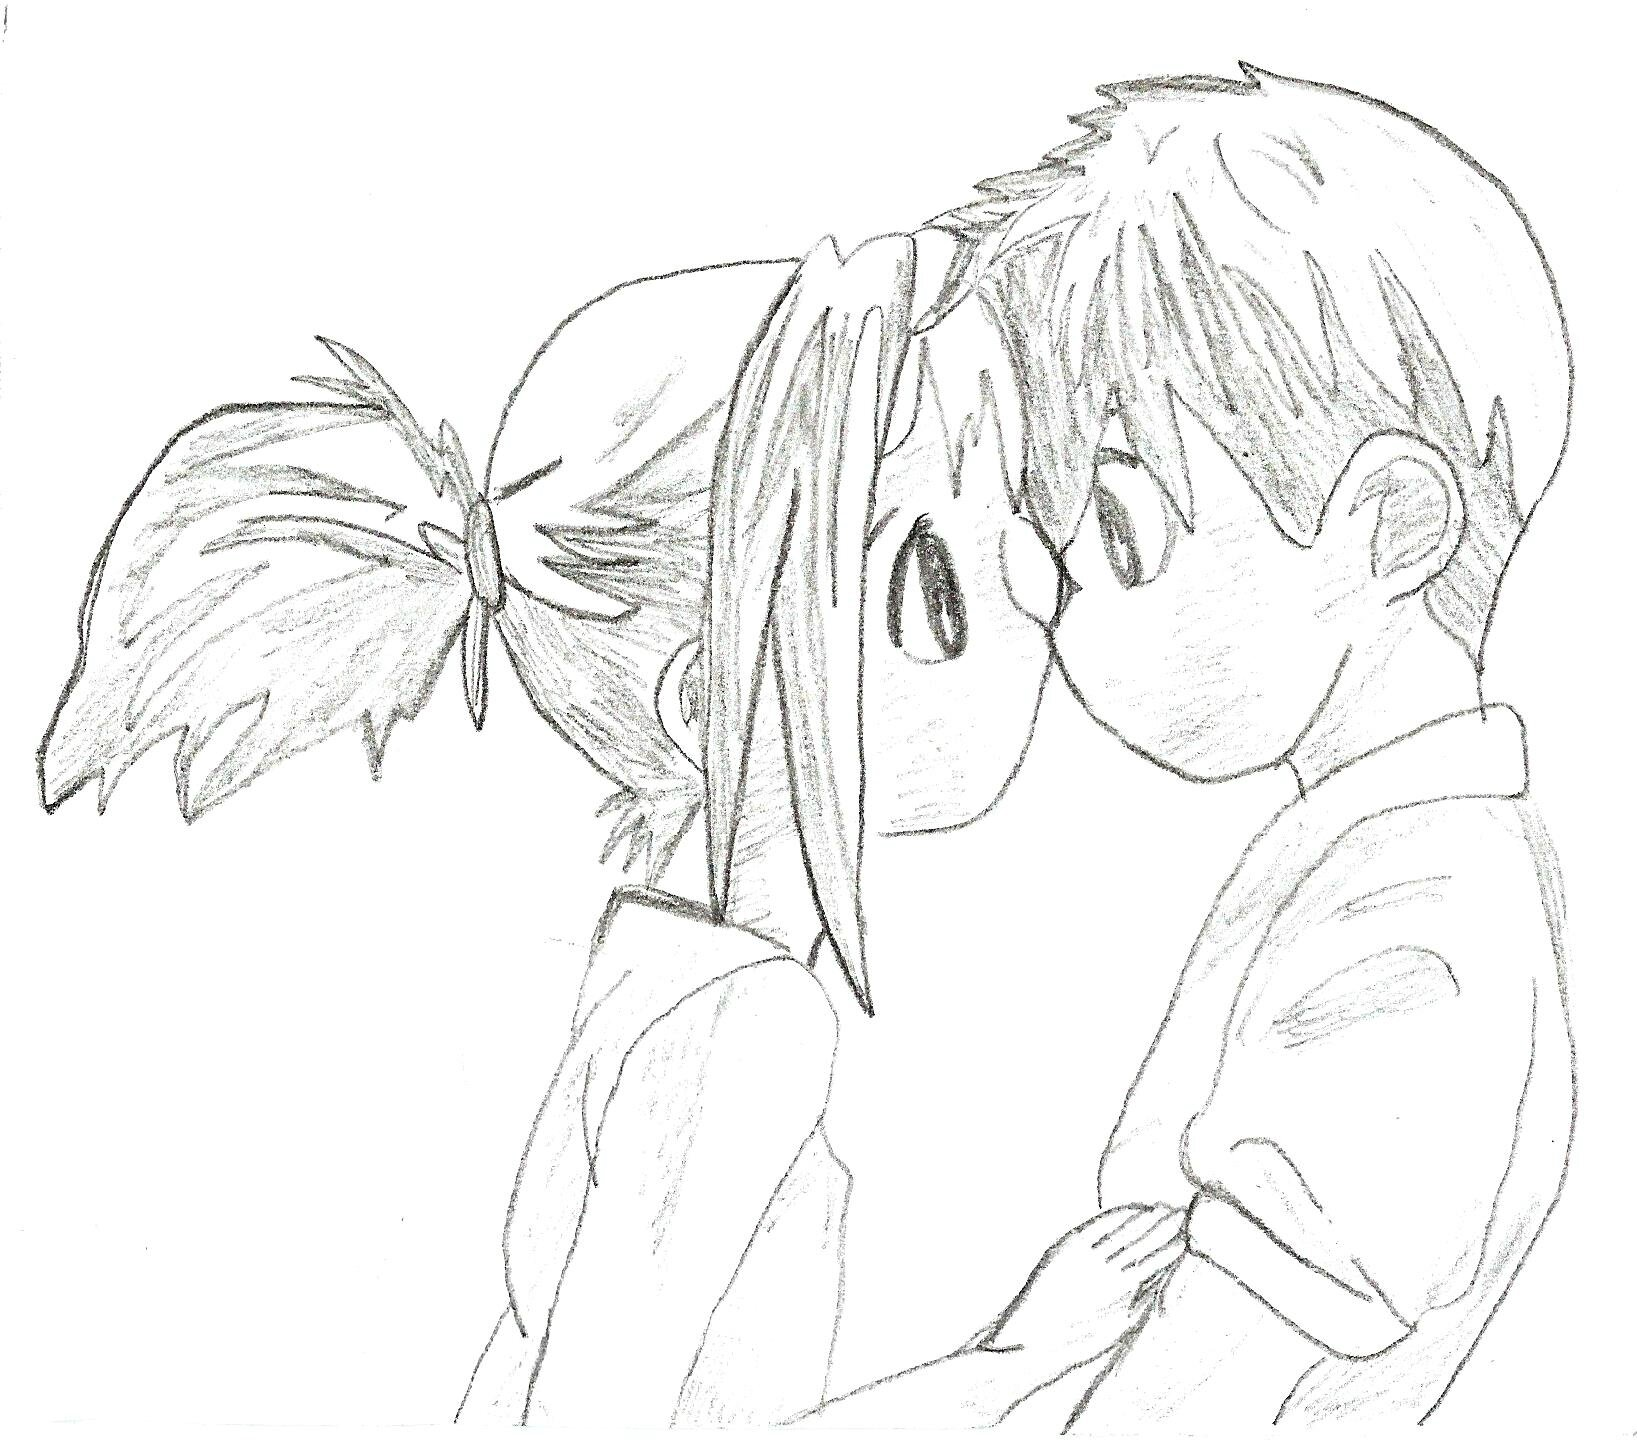 Manga fille mignonne dessin dessin de manga - Dessiner fille manga ...